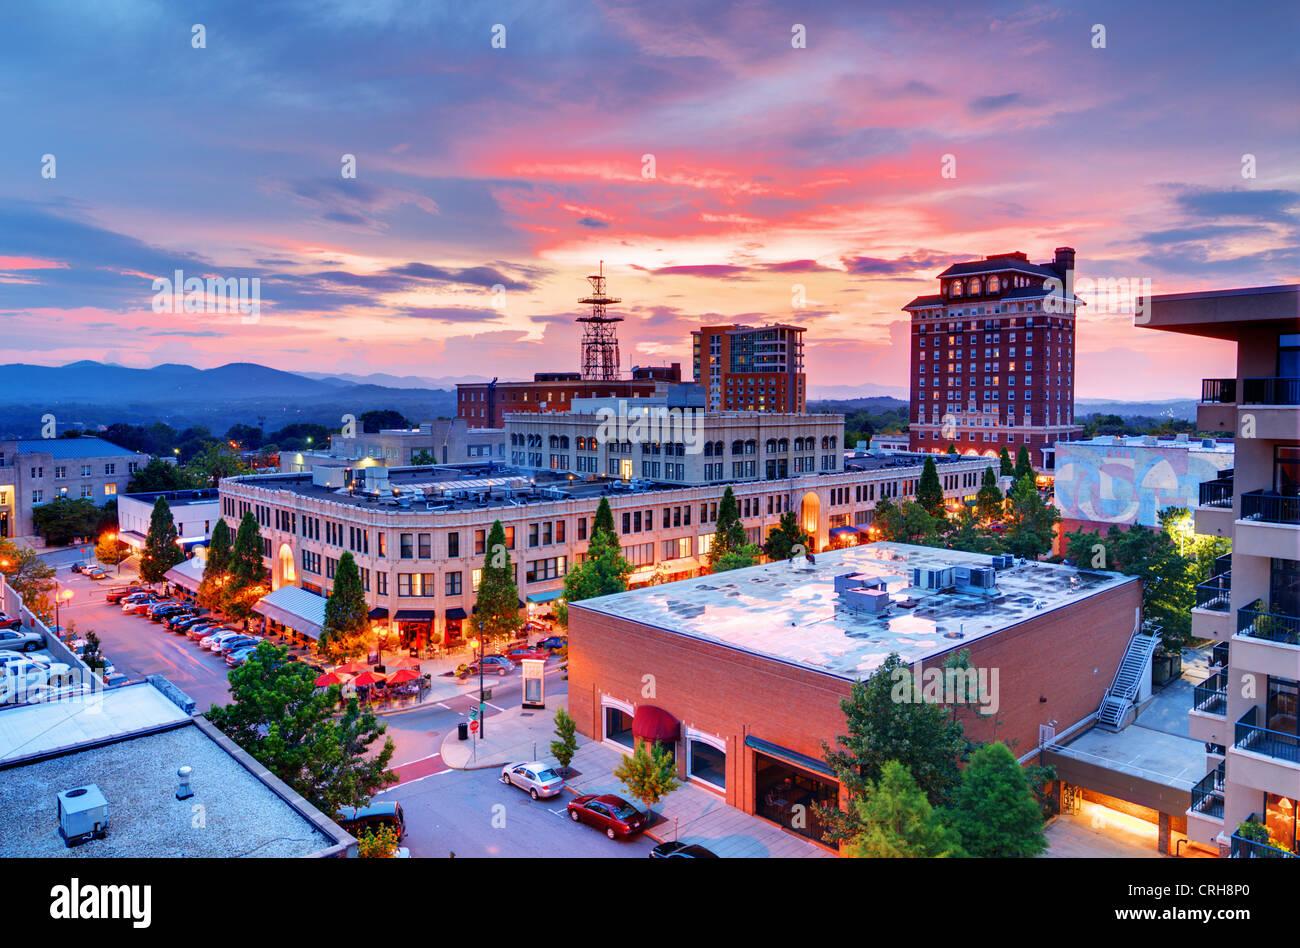 Downtown Asheville, North Carolina at Grove Arcade - Stock Image